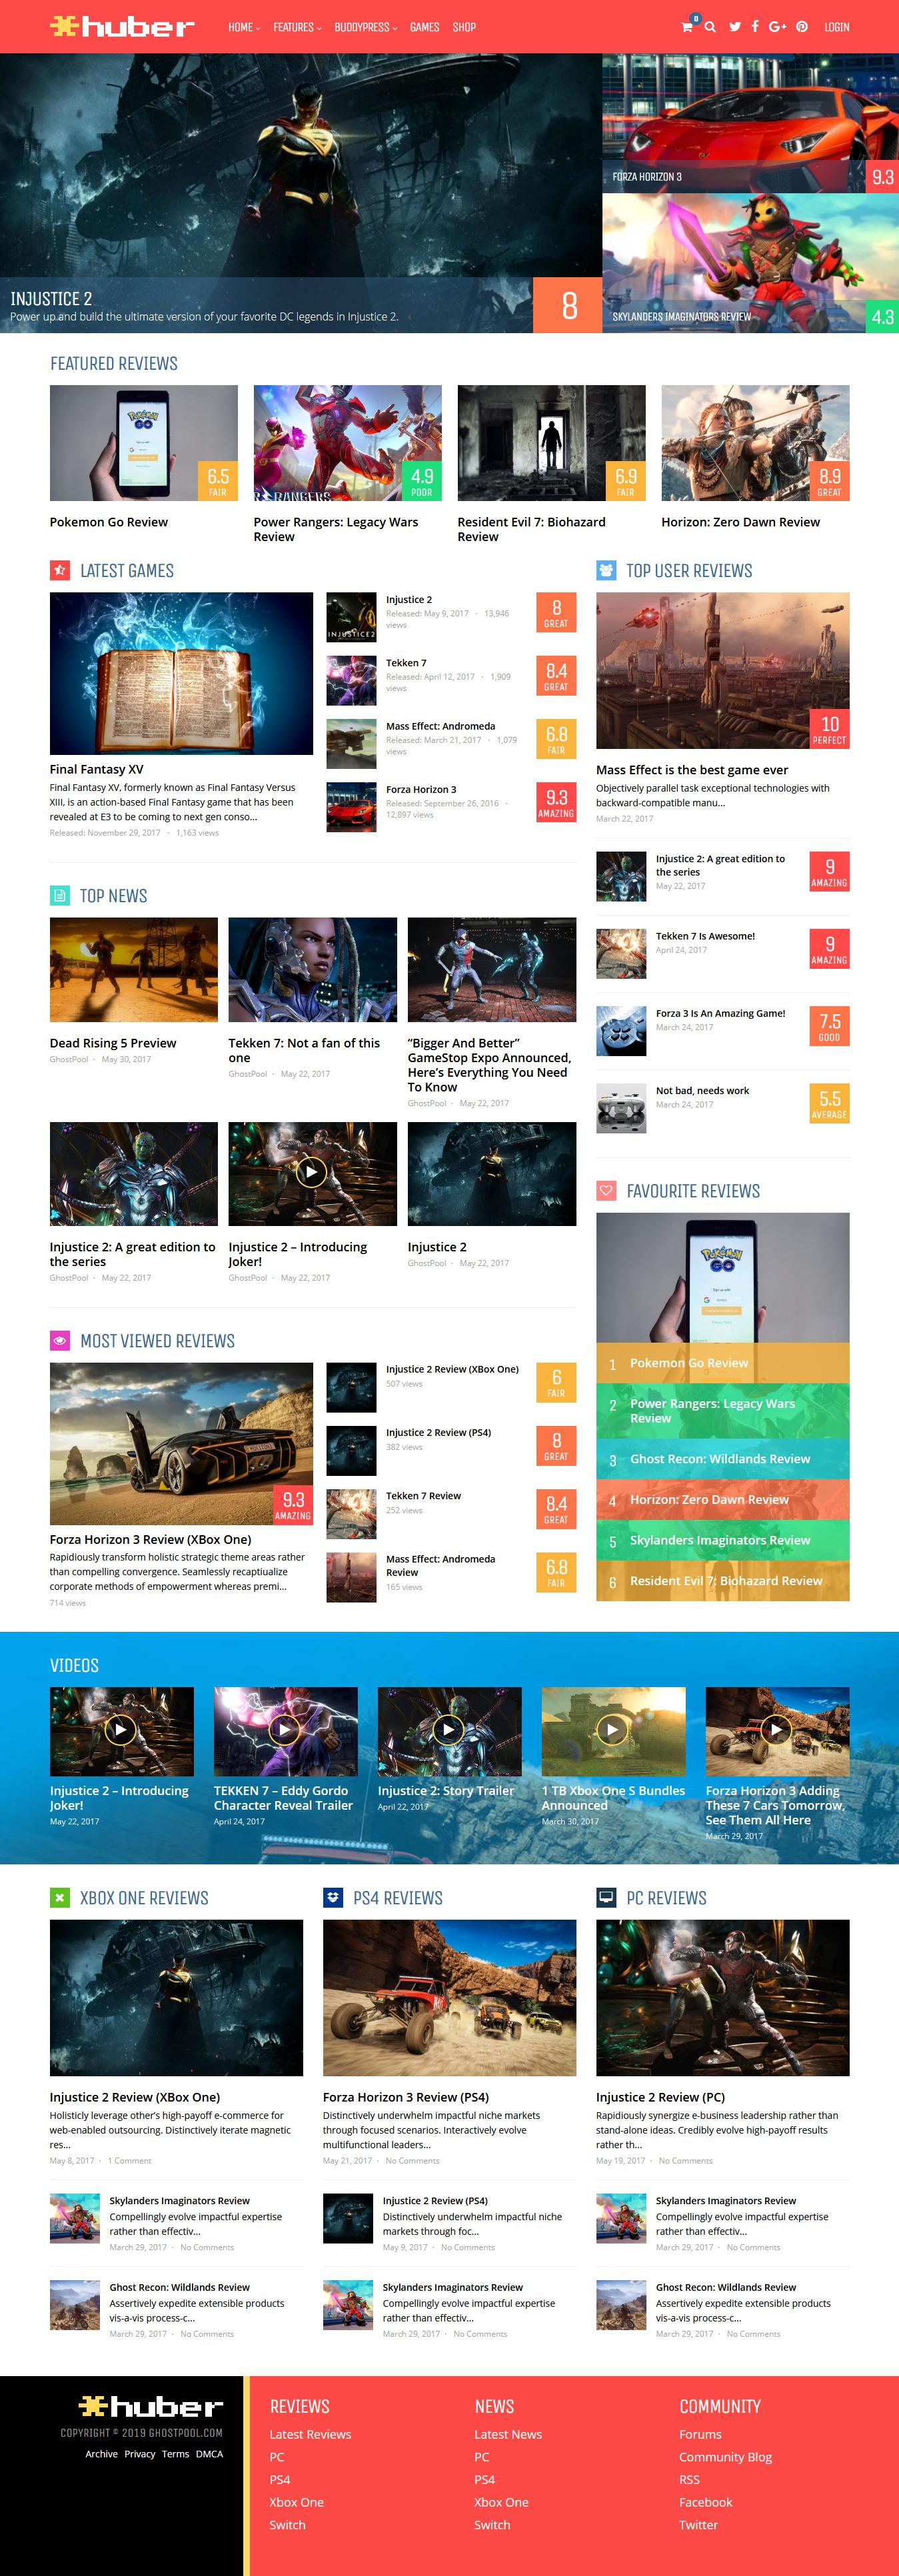 huber best premium review wordpress theme - 10+ Best Premium Review WordPress Themes